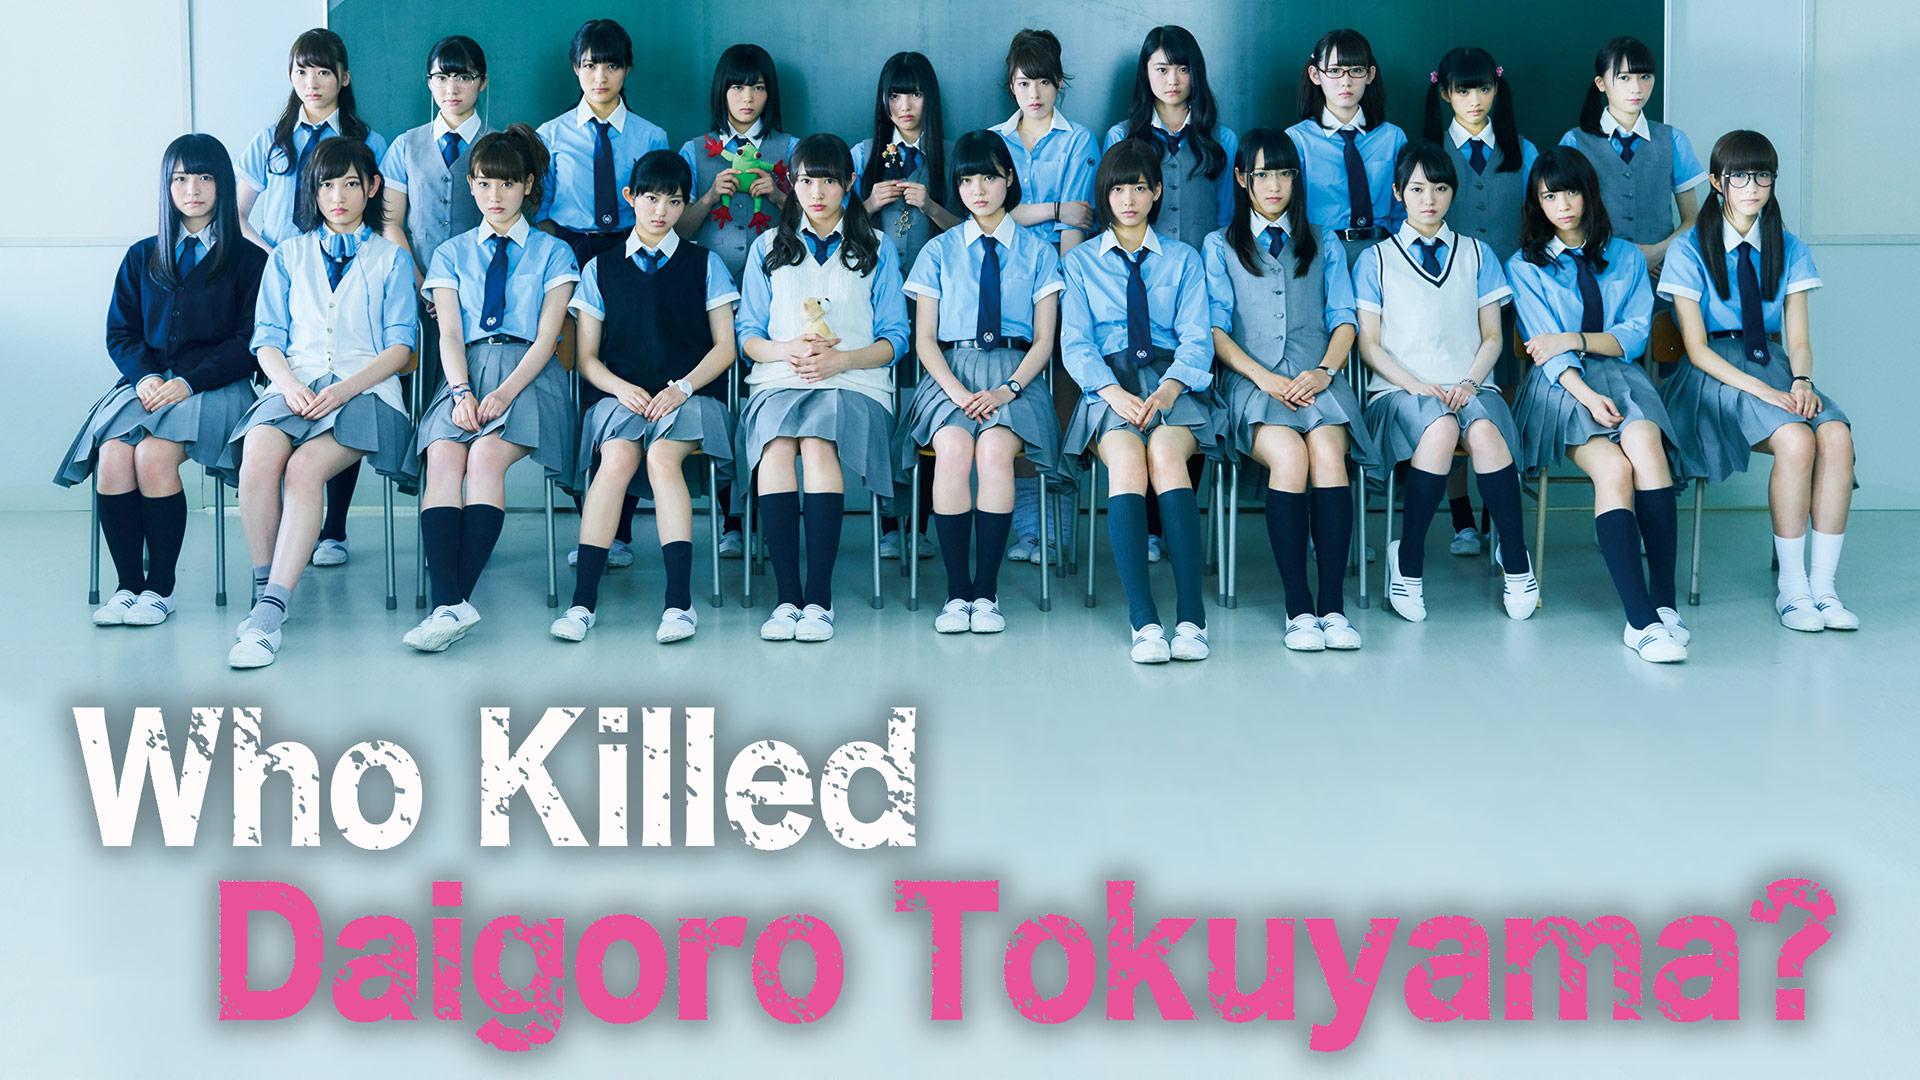 WHO KILLED DAIGORO TOKUYAMA? - Season 1